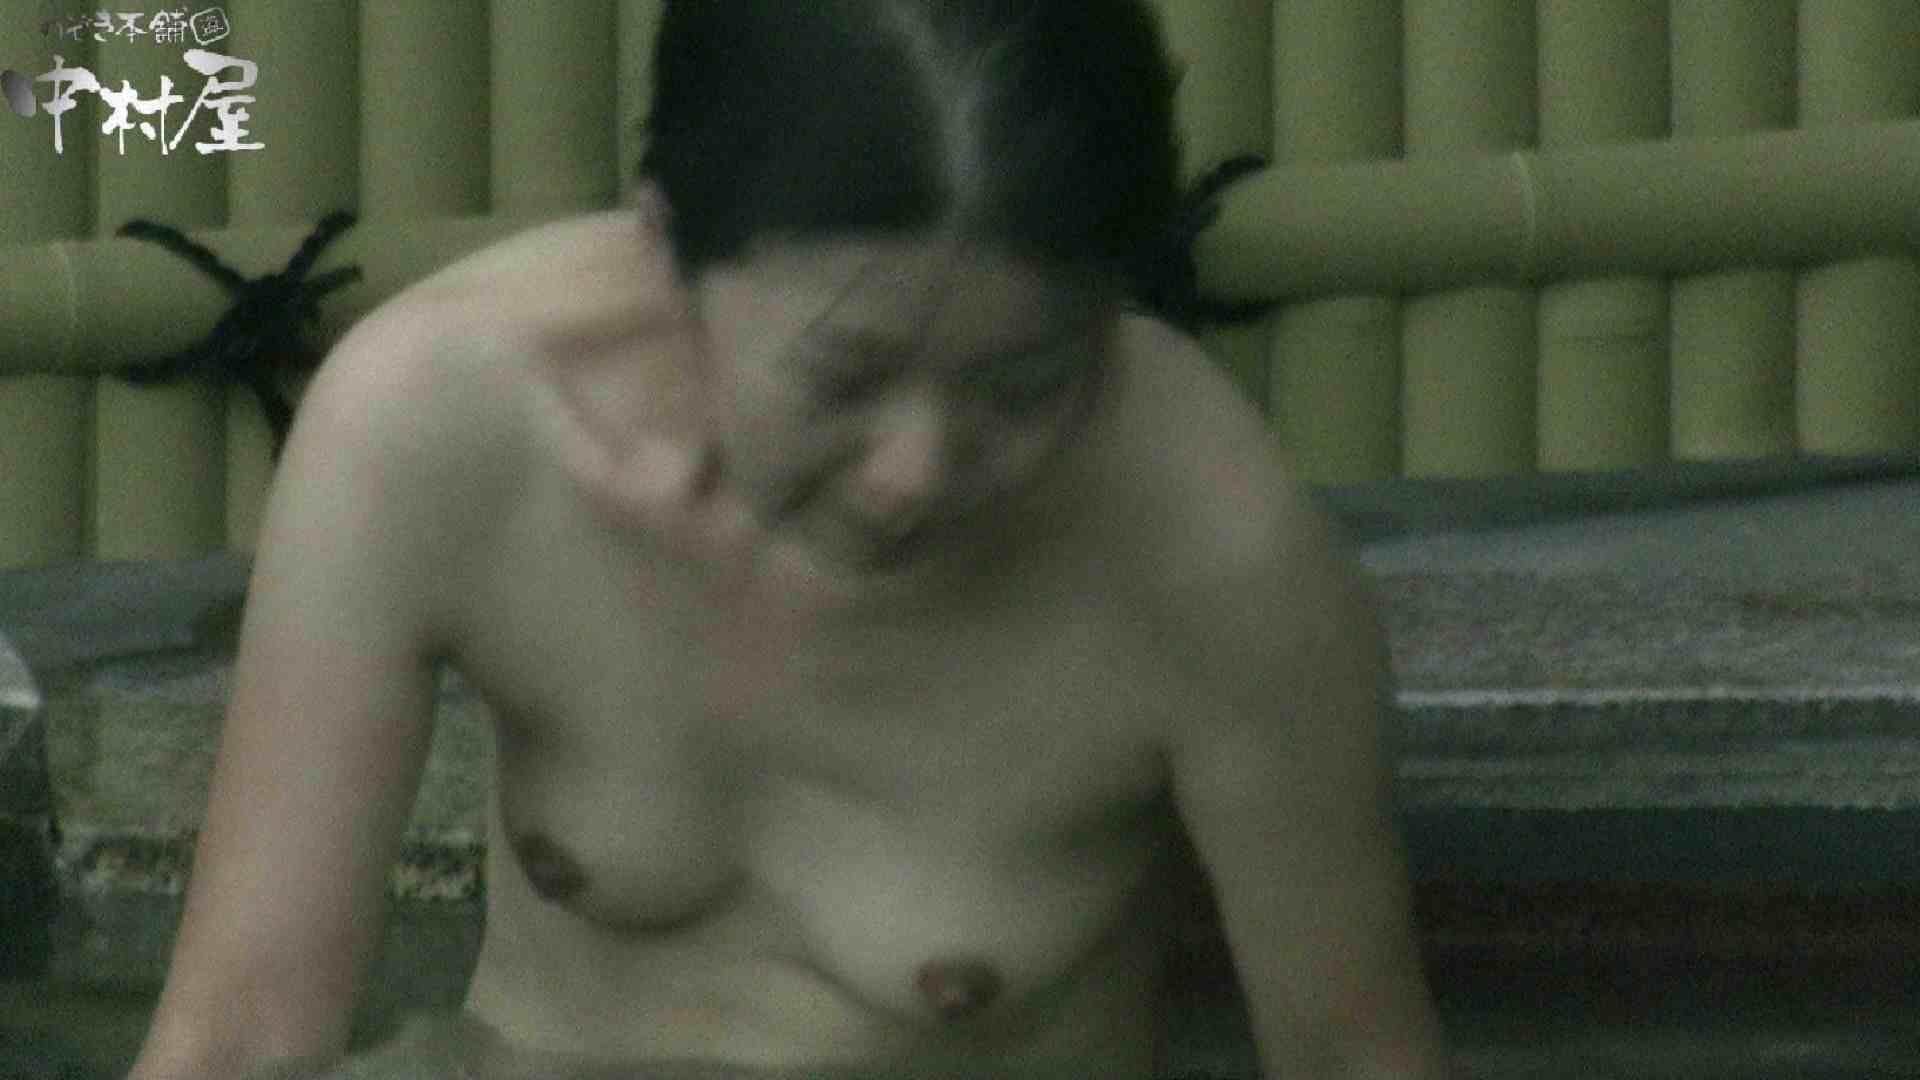 Aquaな露天風呂Vol.904 美しいOLの裸体 オメコ動画キャプチャ 103pic 98